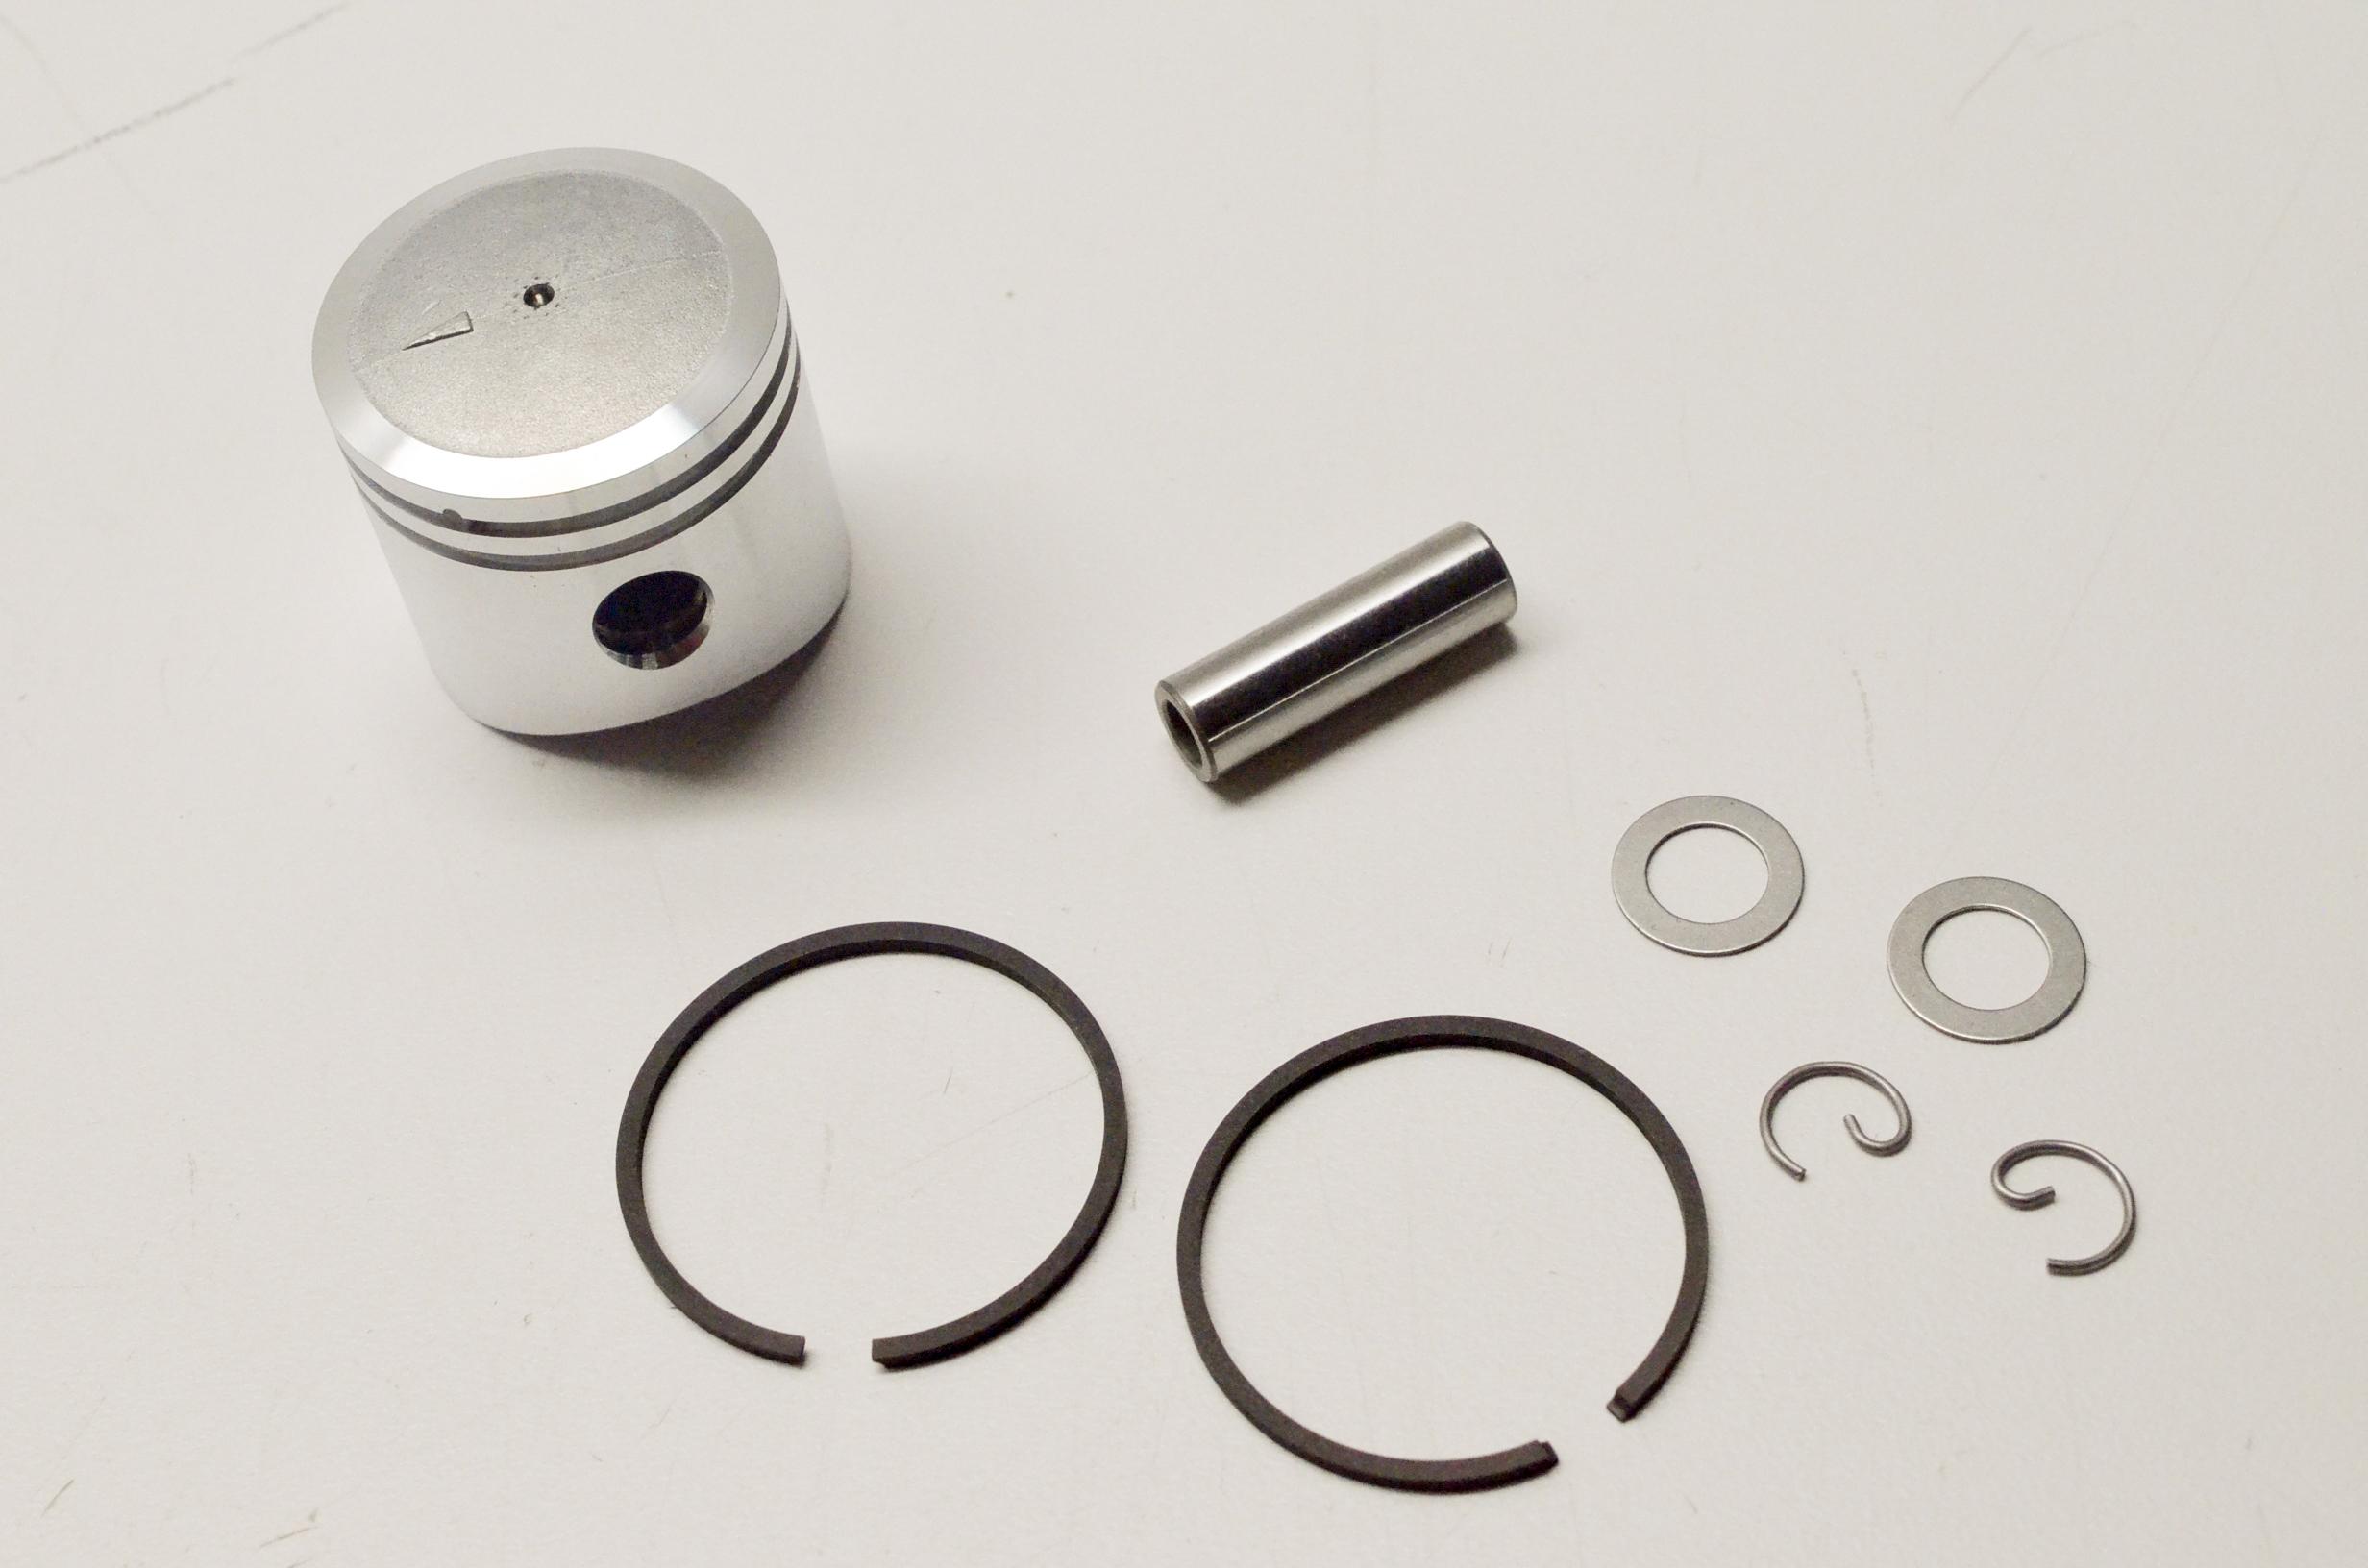 32.2mm #10000044331, #10000044330 Piston Kit for ECHO Machines